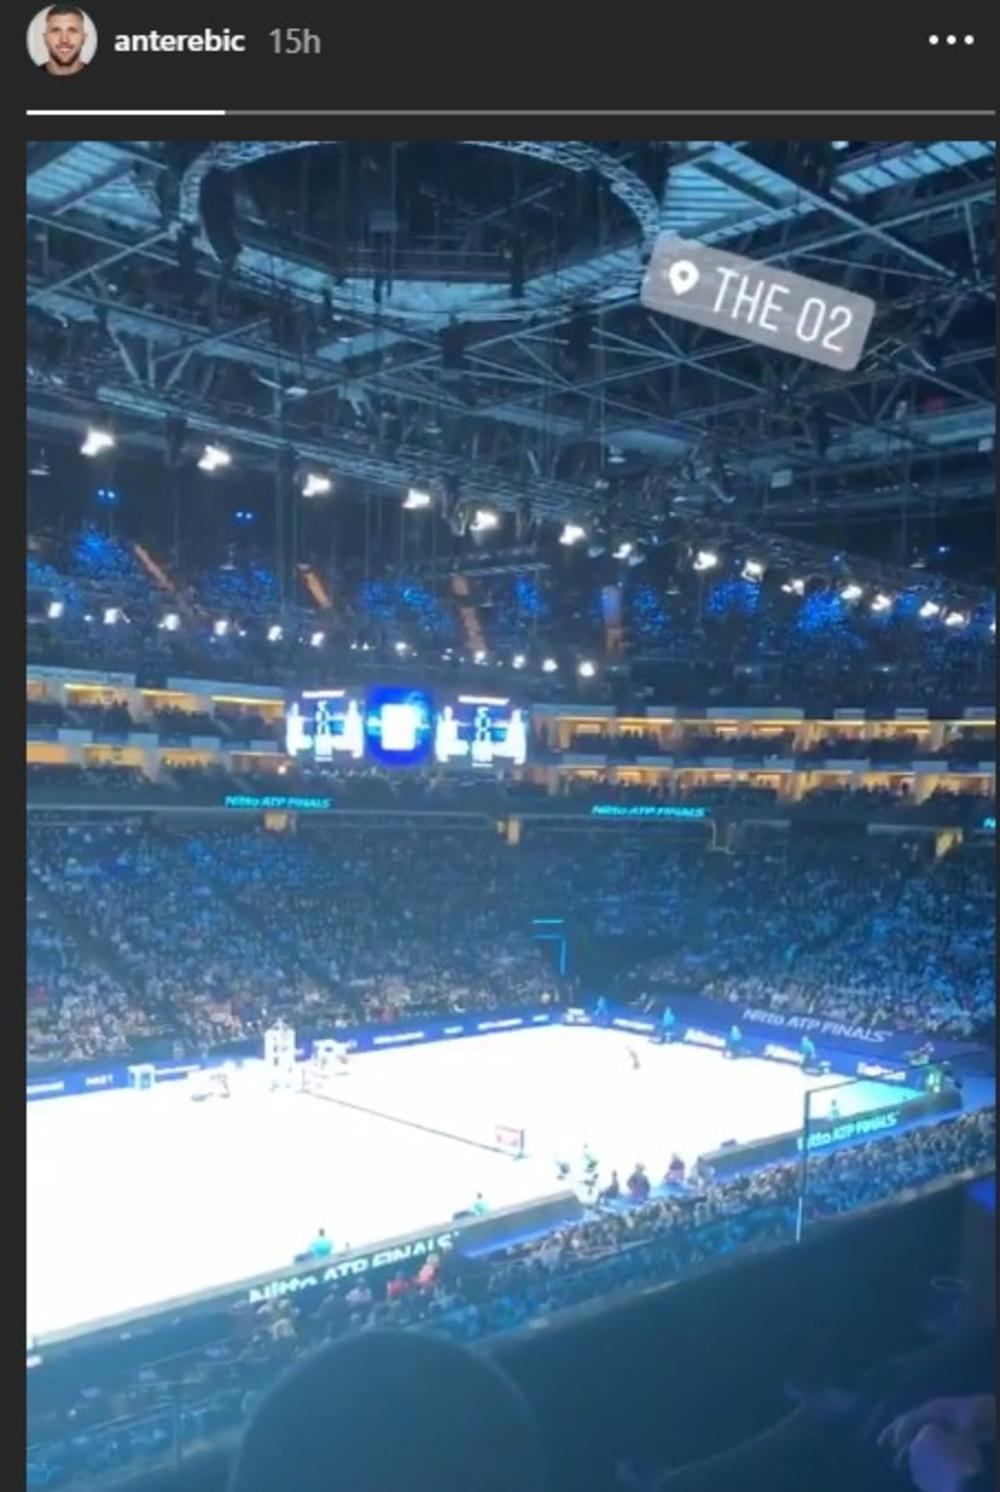 Anti Ribian released a rehearsal for Djokovic in London